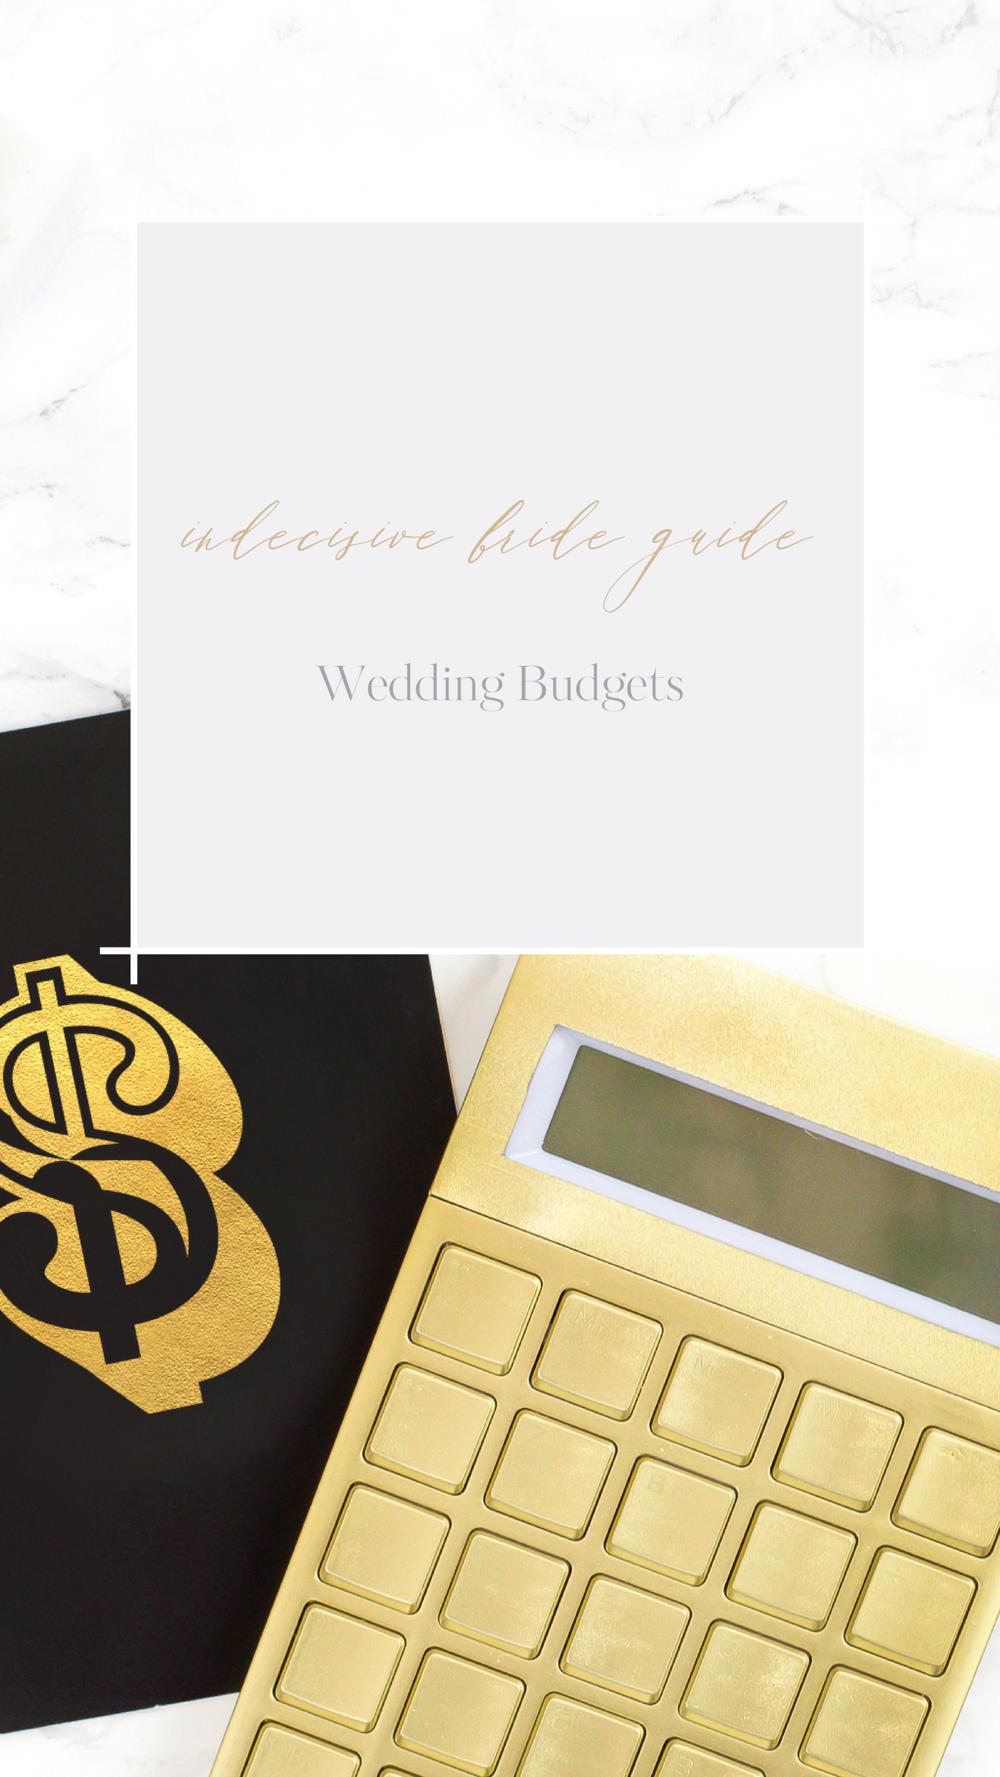 IBG Wedding Budgets.png